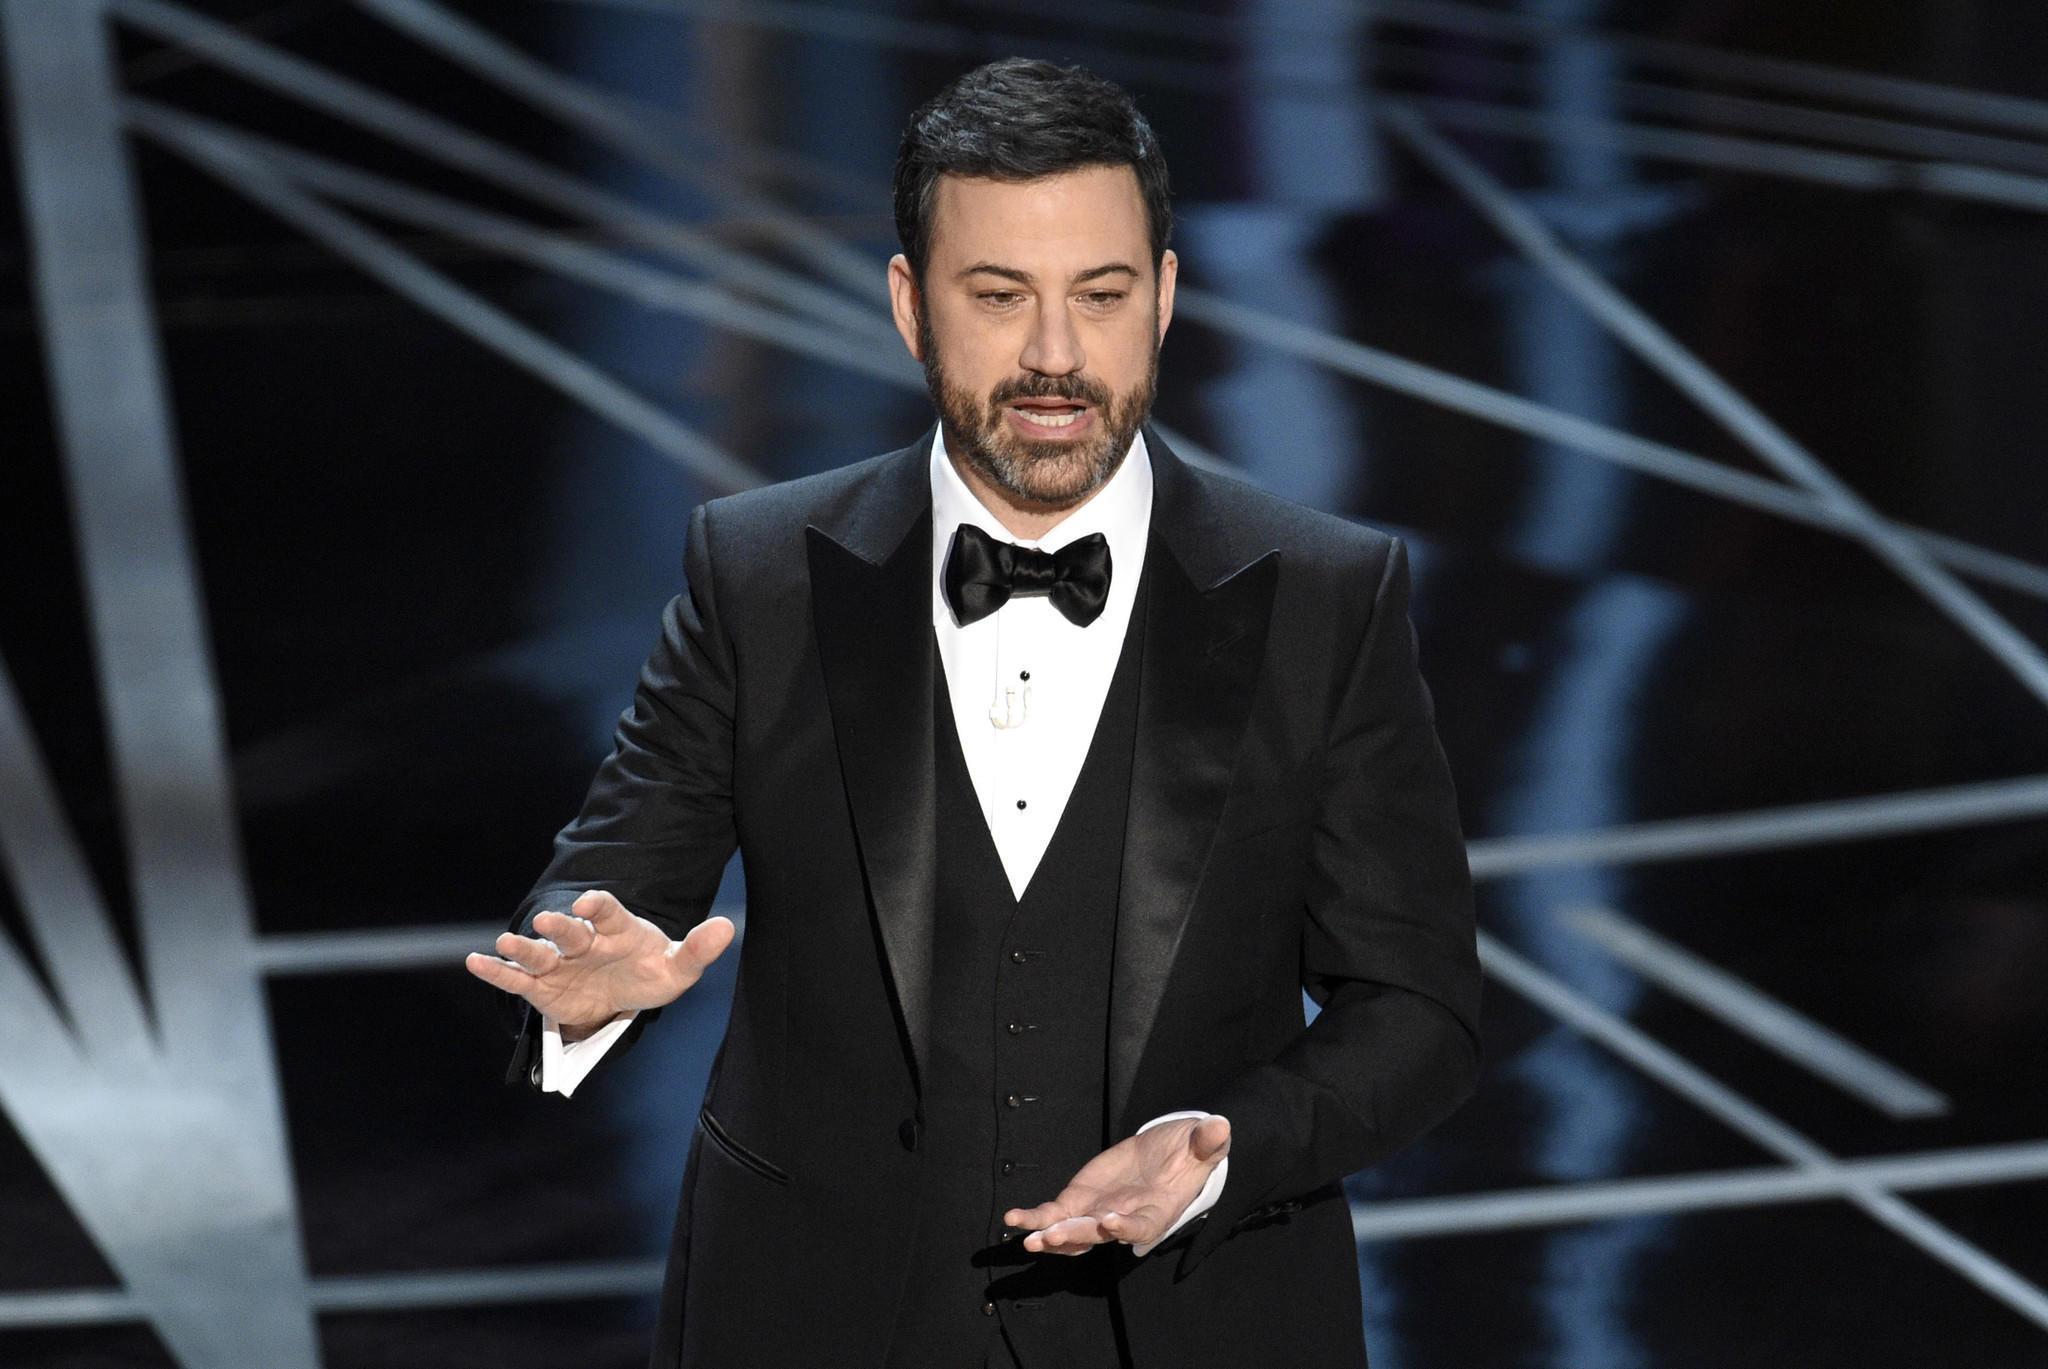 Trump Got You Down Jimmy Kimmel Has A Novel Idea Let S Make America Great Britain Again Baltimore Sun